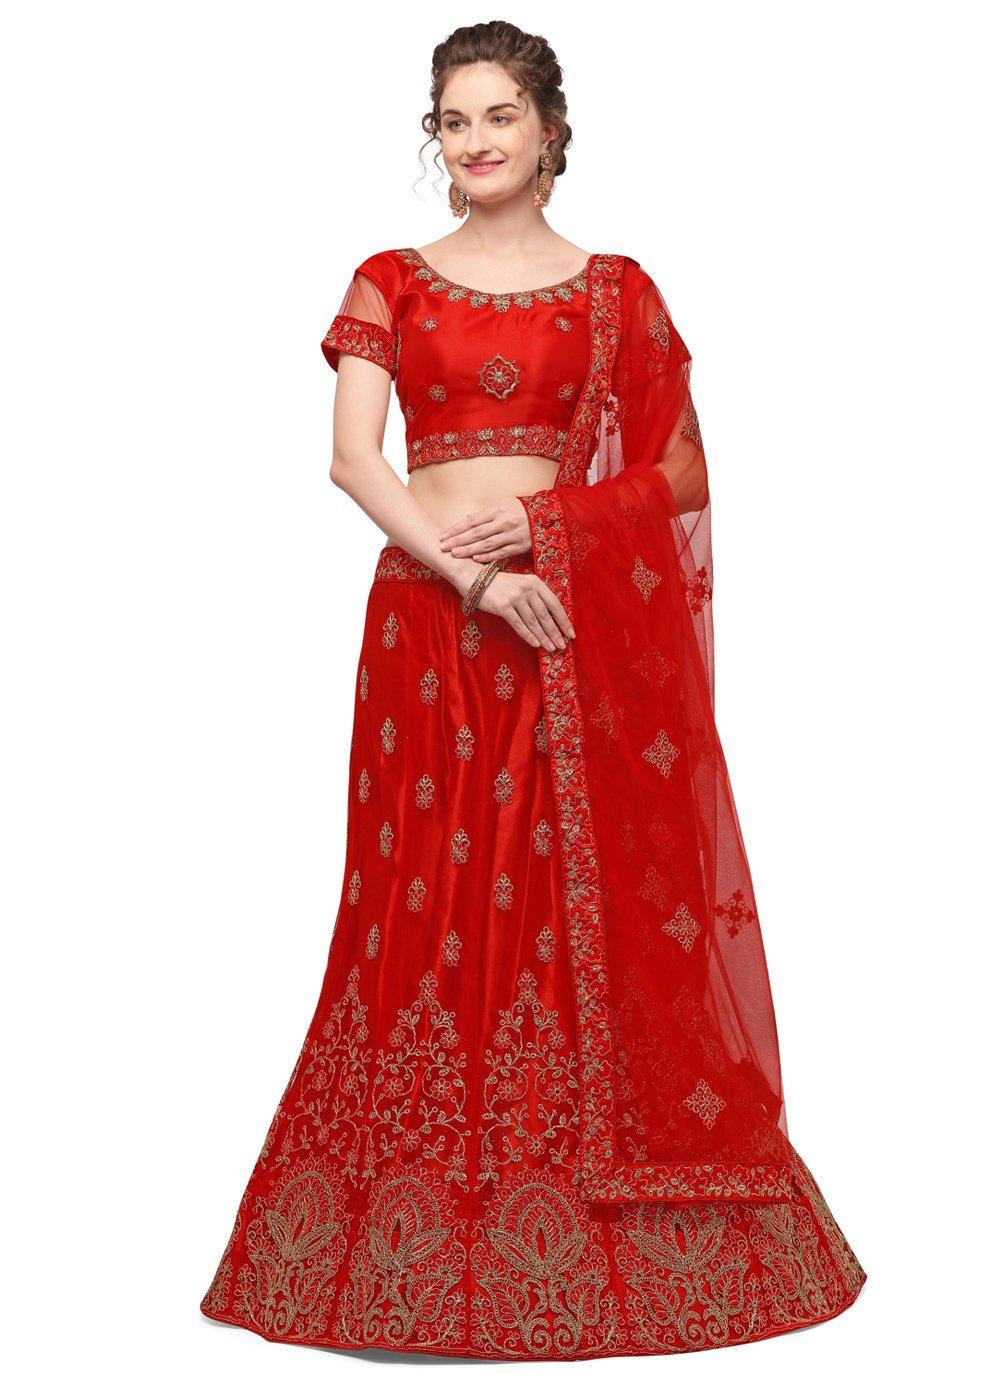 Net Embroidered Red Lehenga Choli